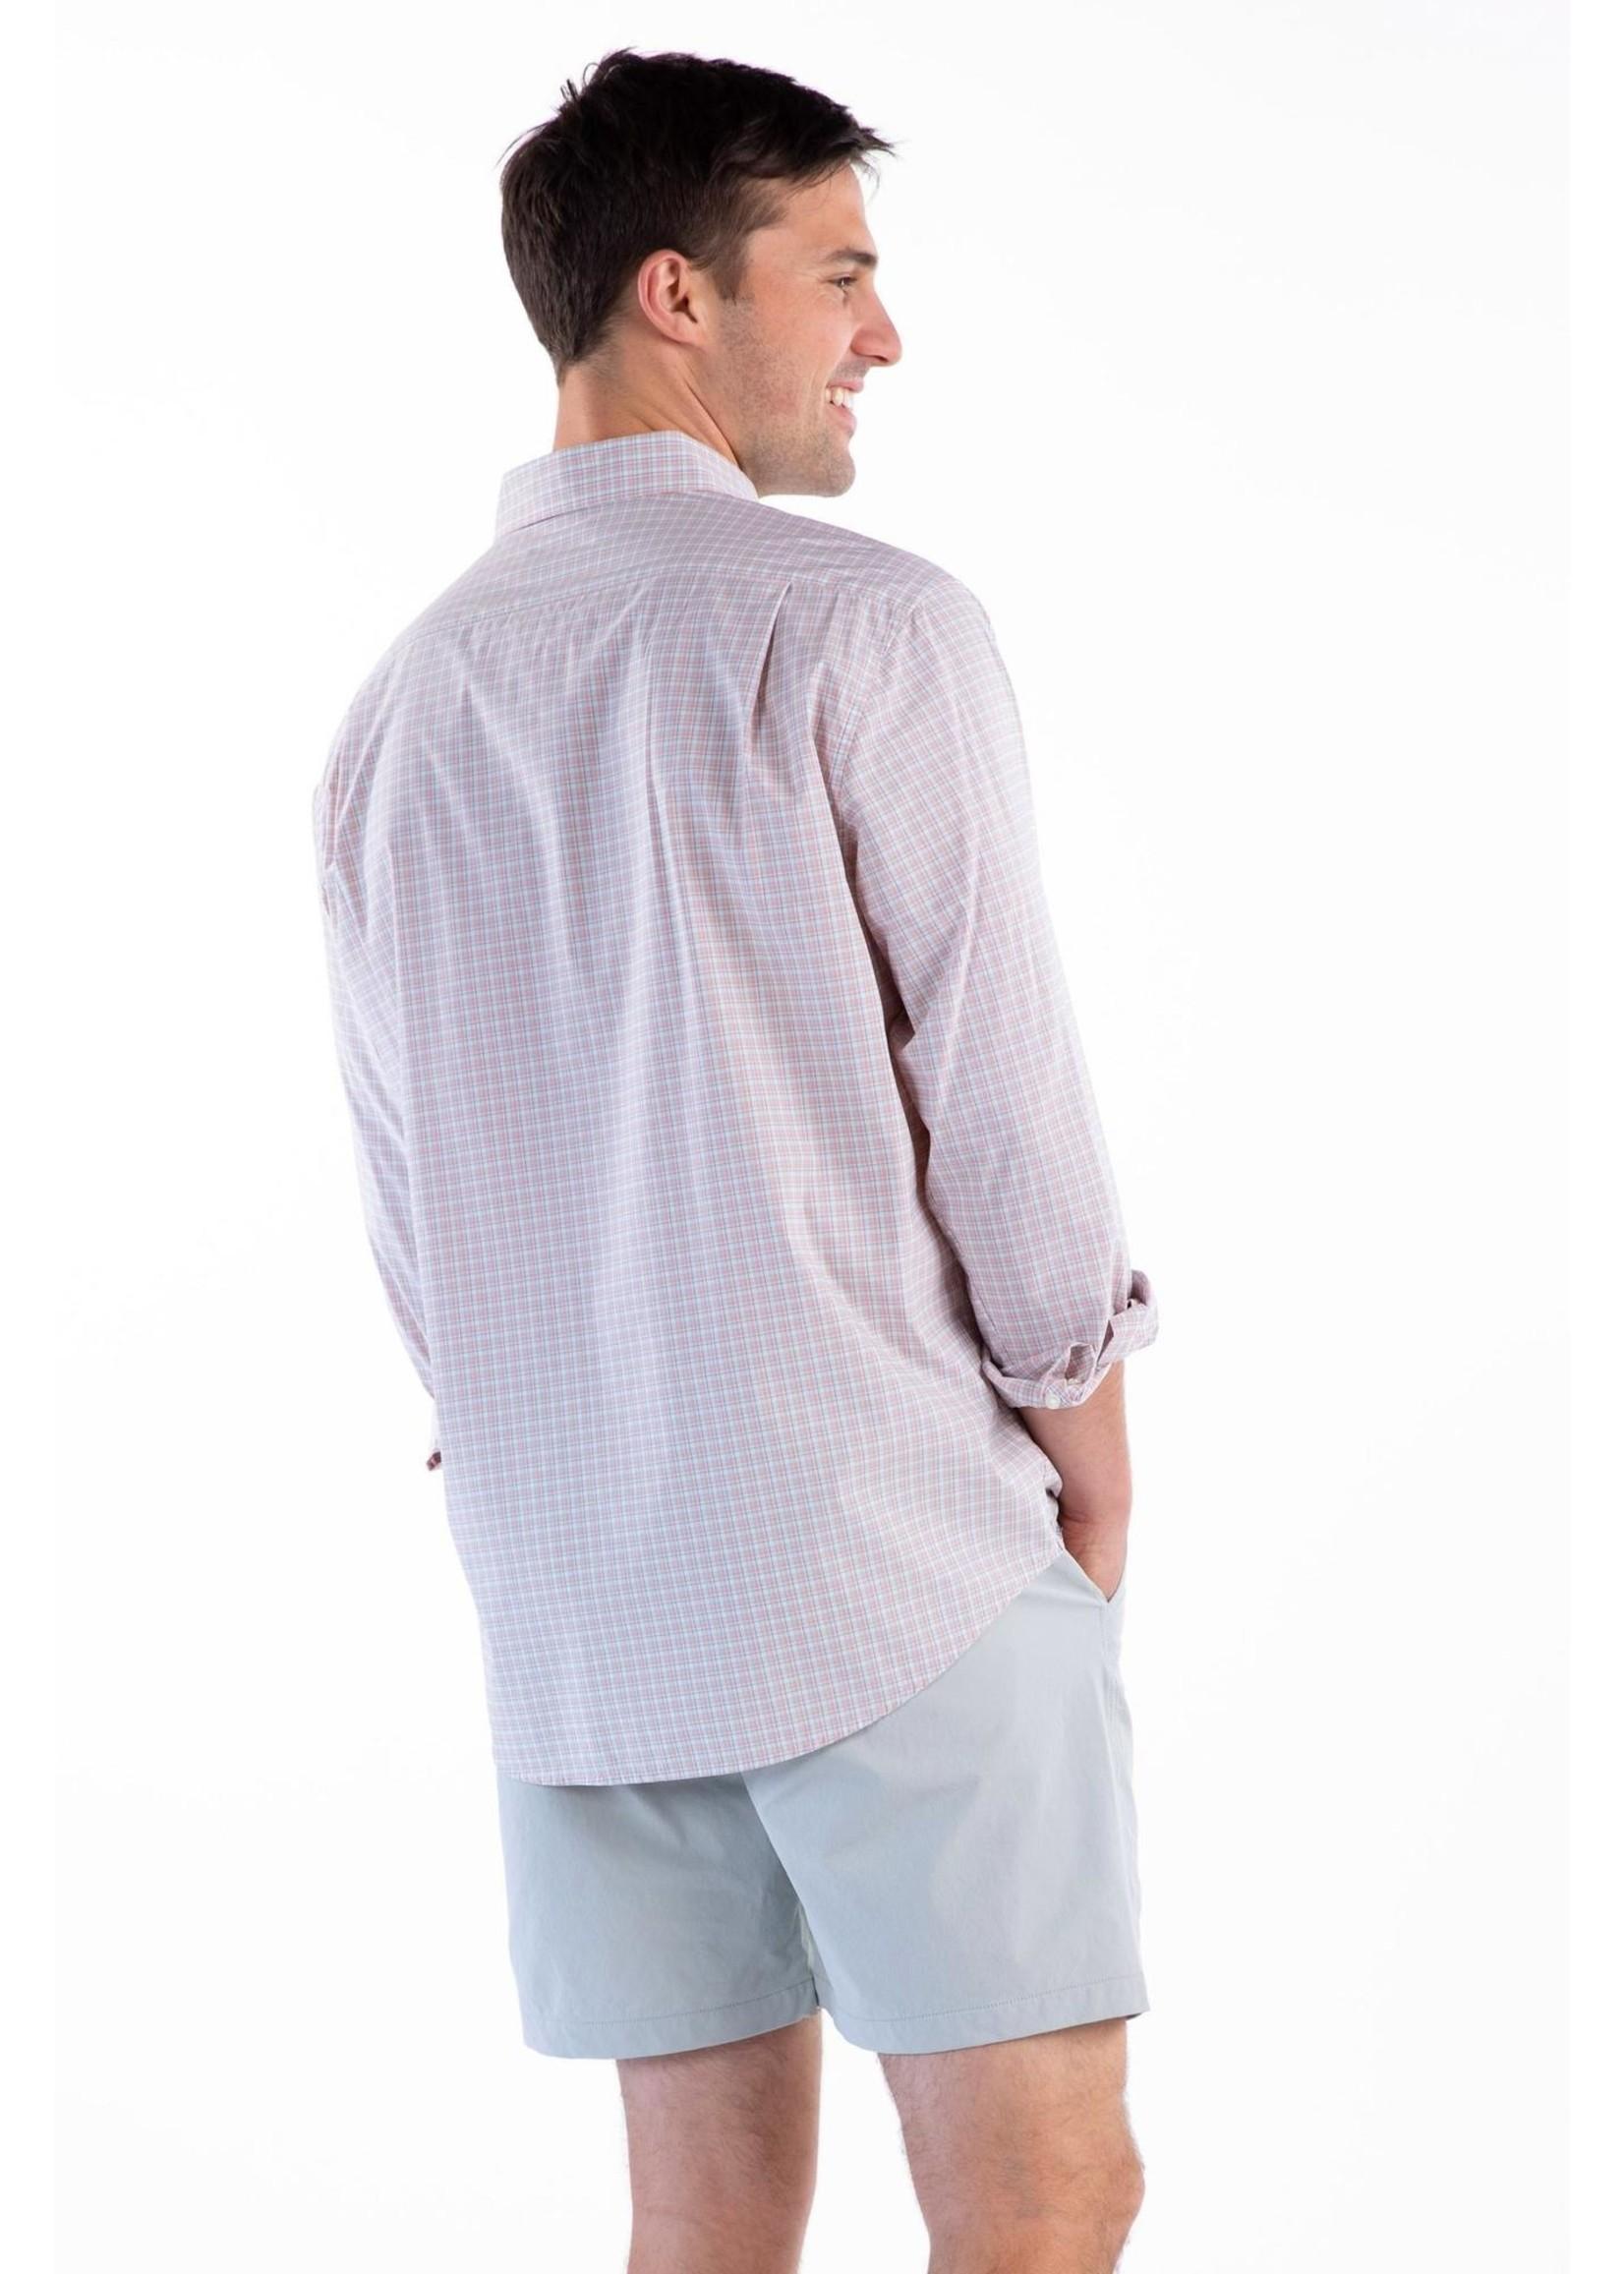 Southern Shirt Daphne Plaid  Dress Shirt